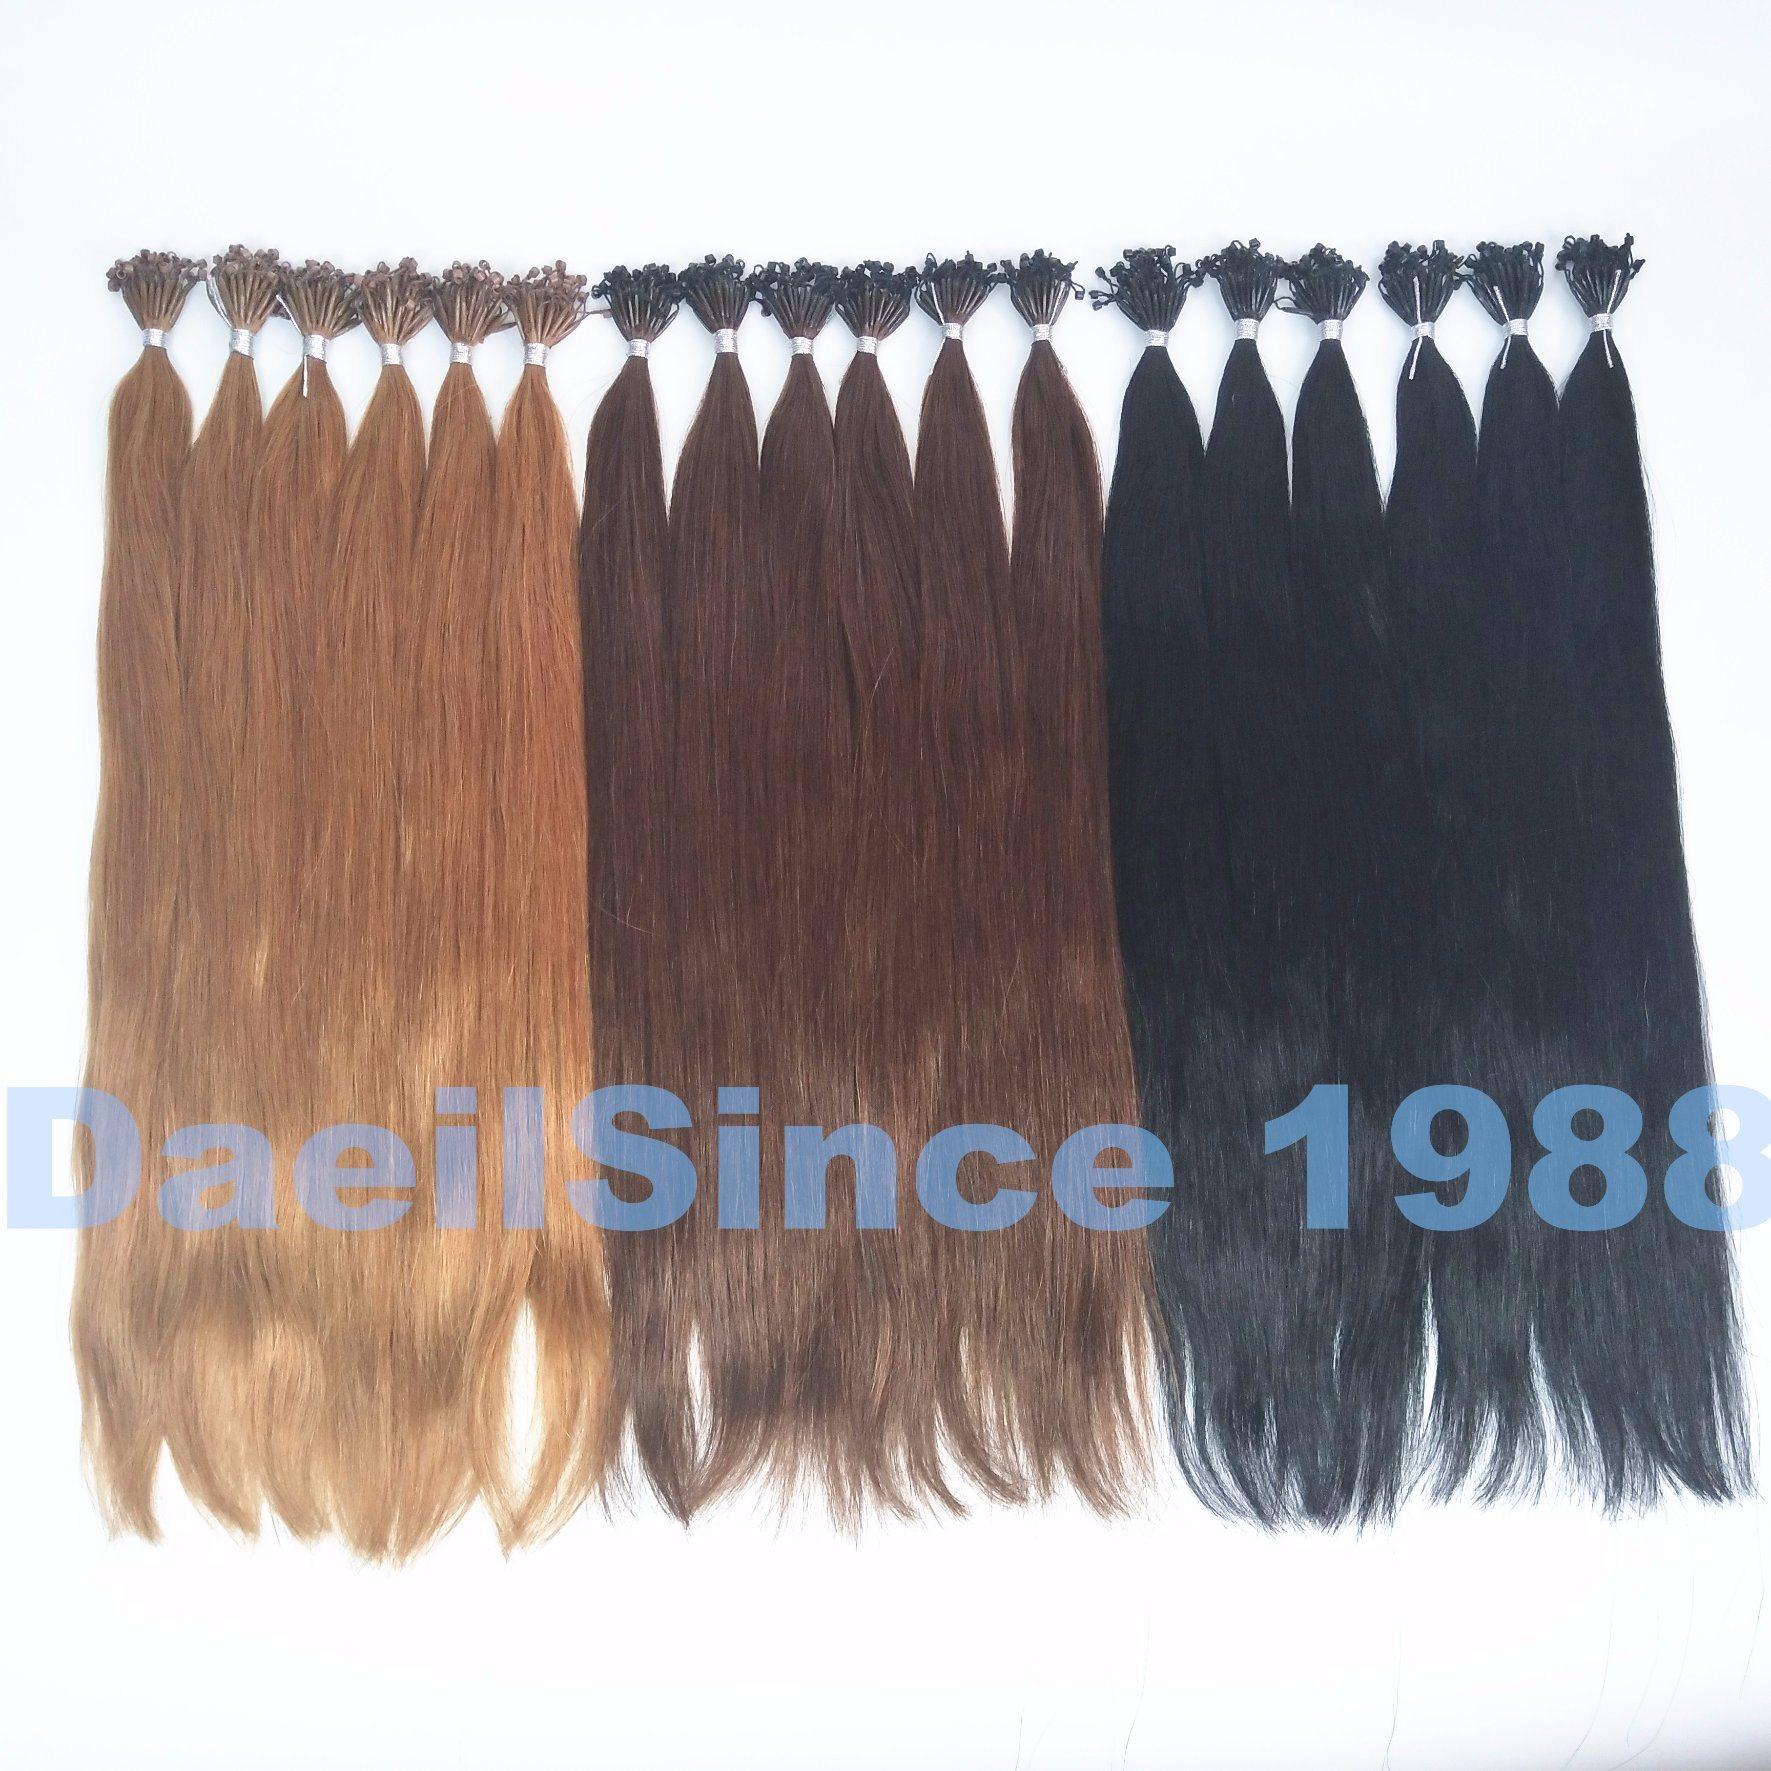 China Dropshipping Remy Hair Extensions China Clip Hair Extension